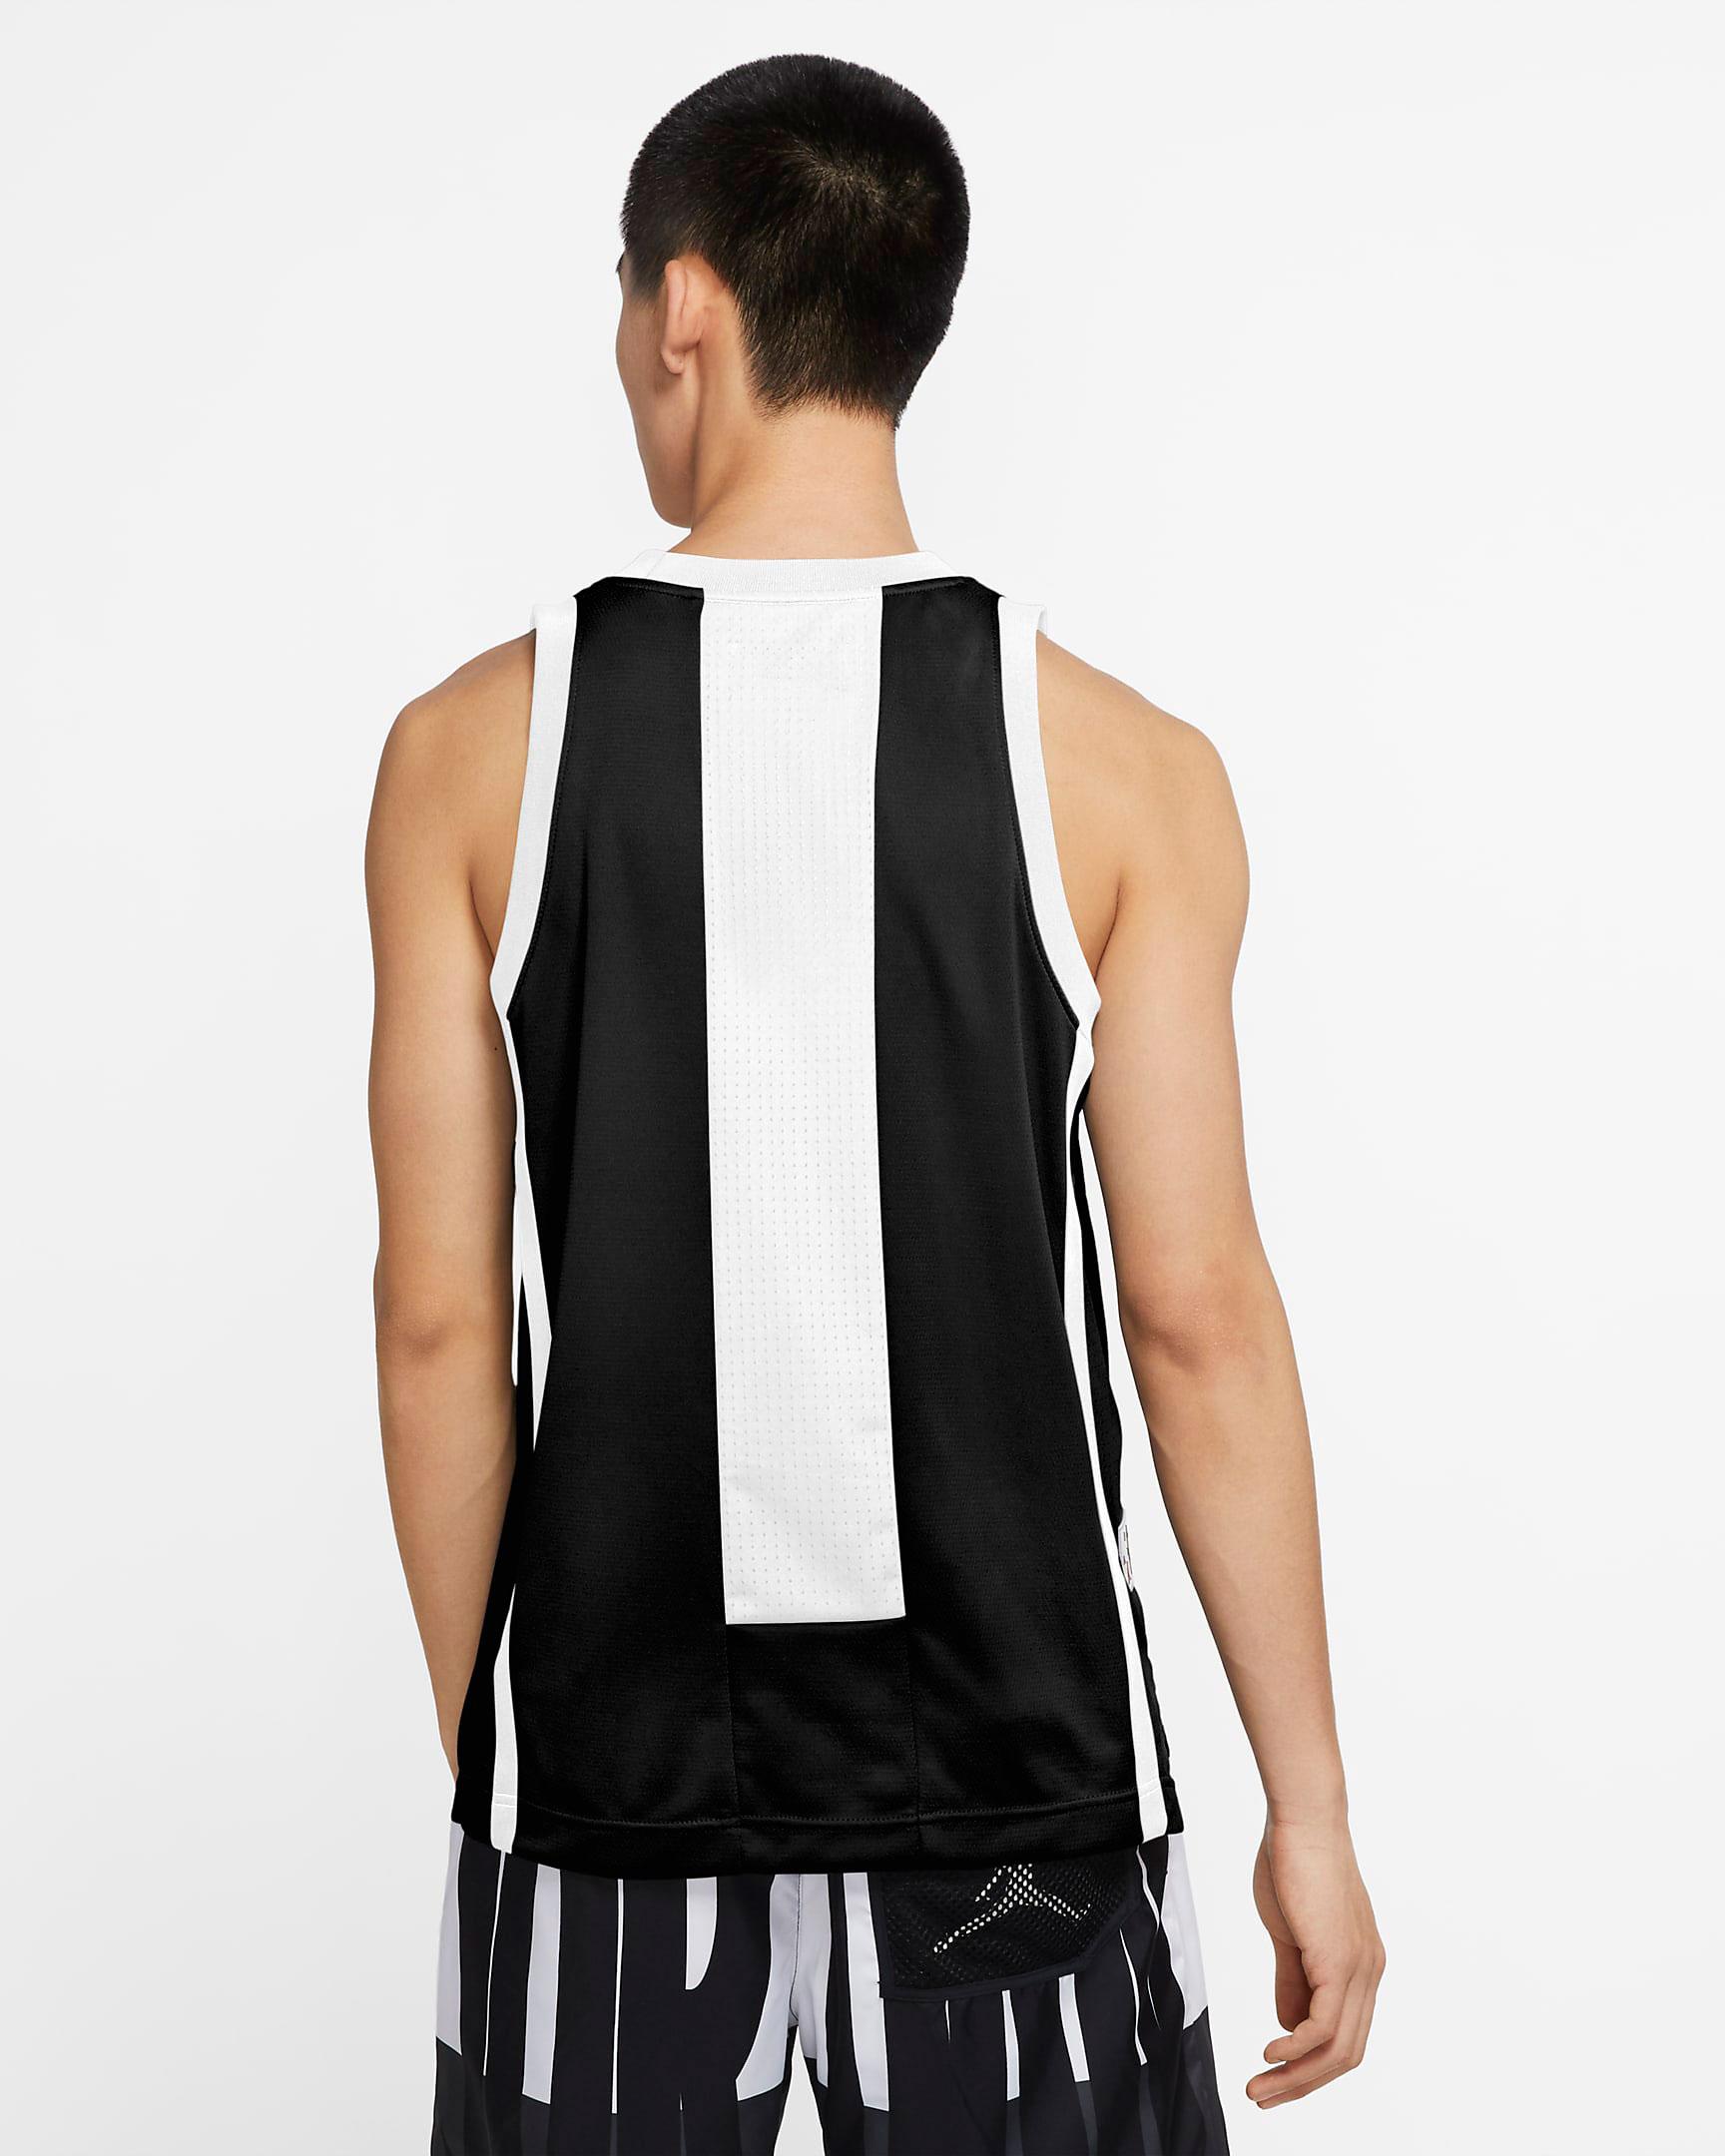 air-jordan-11-jubilee-black-white-jordan-jersey-4